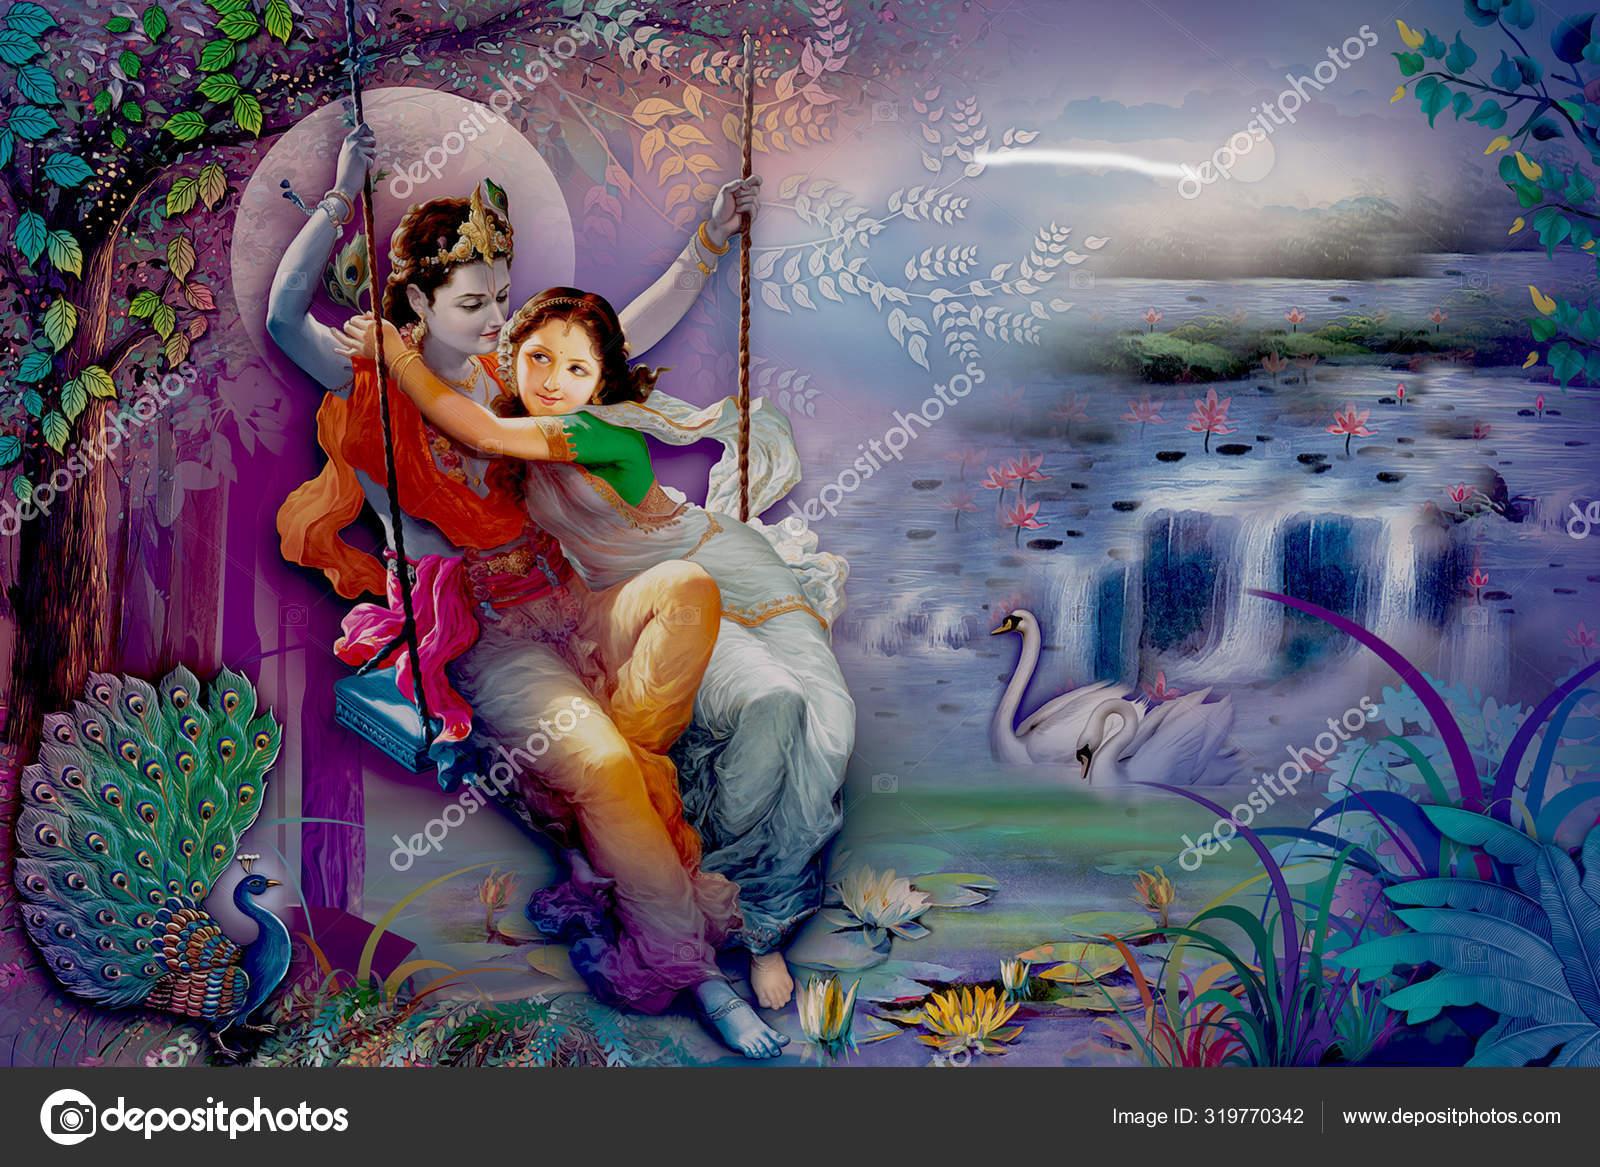 depositphotos 319770342 stock photo lord radha krishna beautiful wallpaper